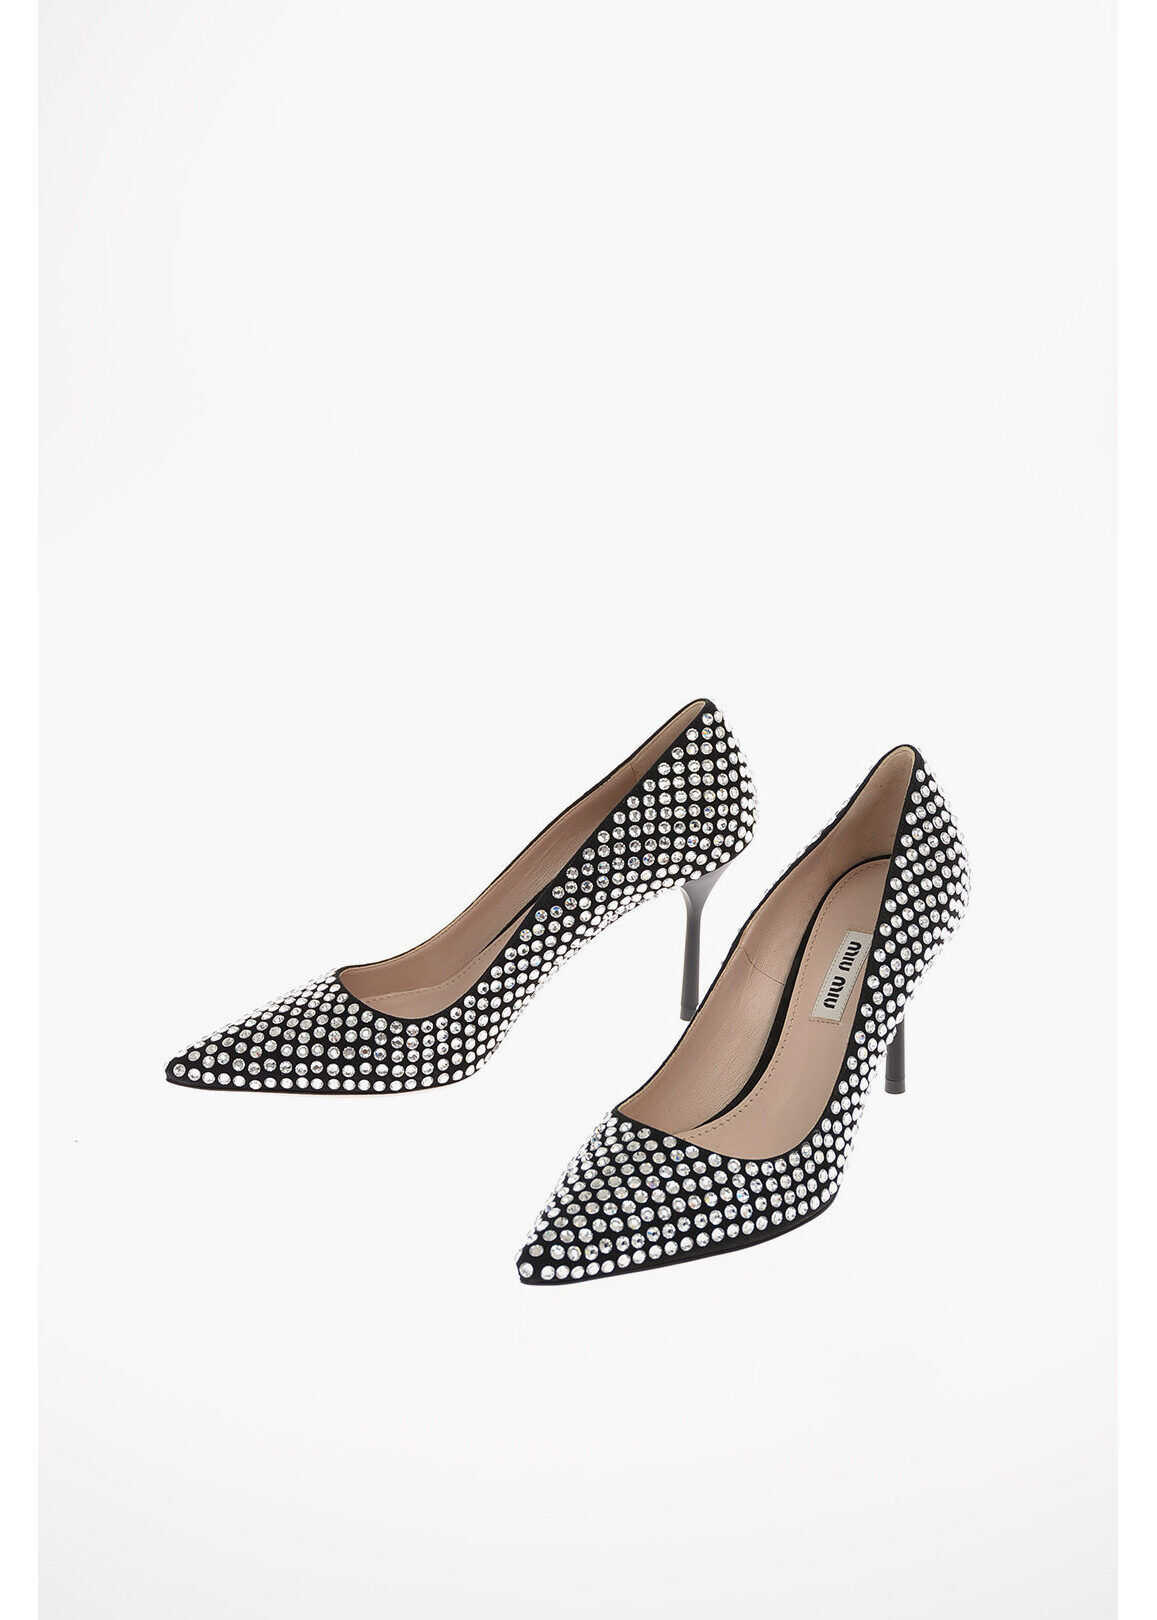 Miu Miu Suede Jewel Pumps with Stiletto Heel 9 Cm BLACK imagine b-mall.ro